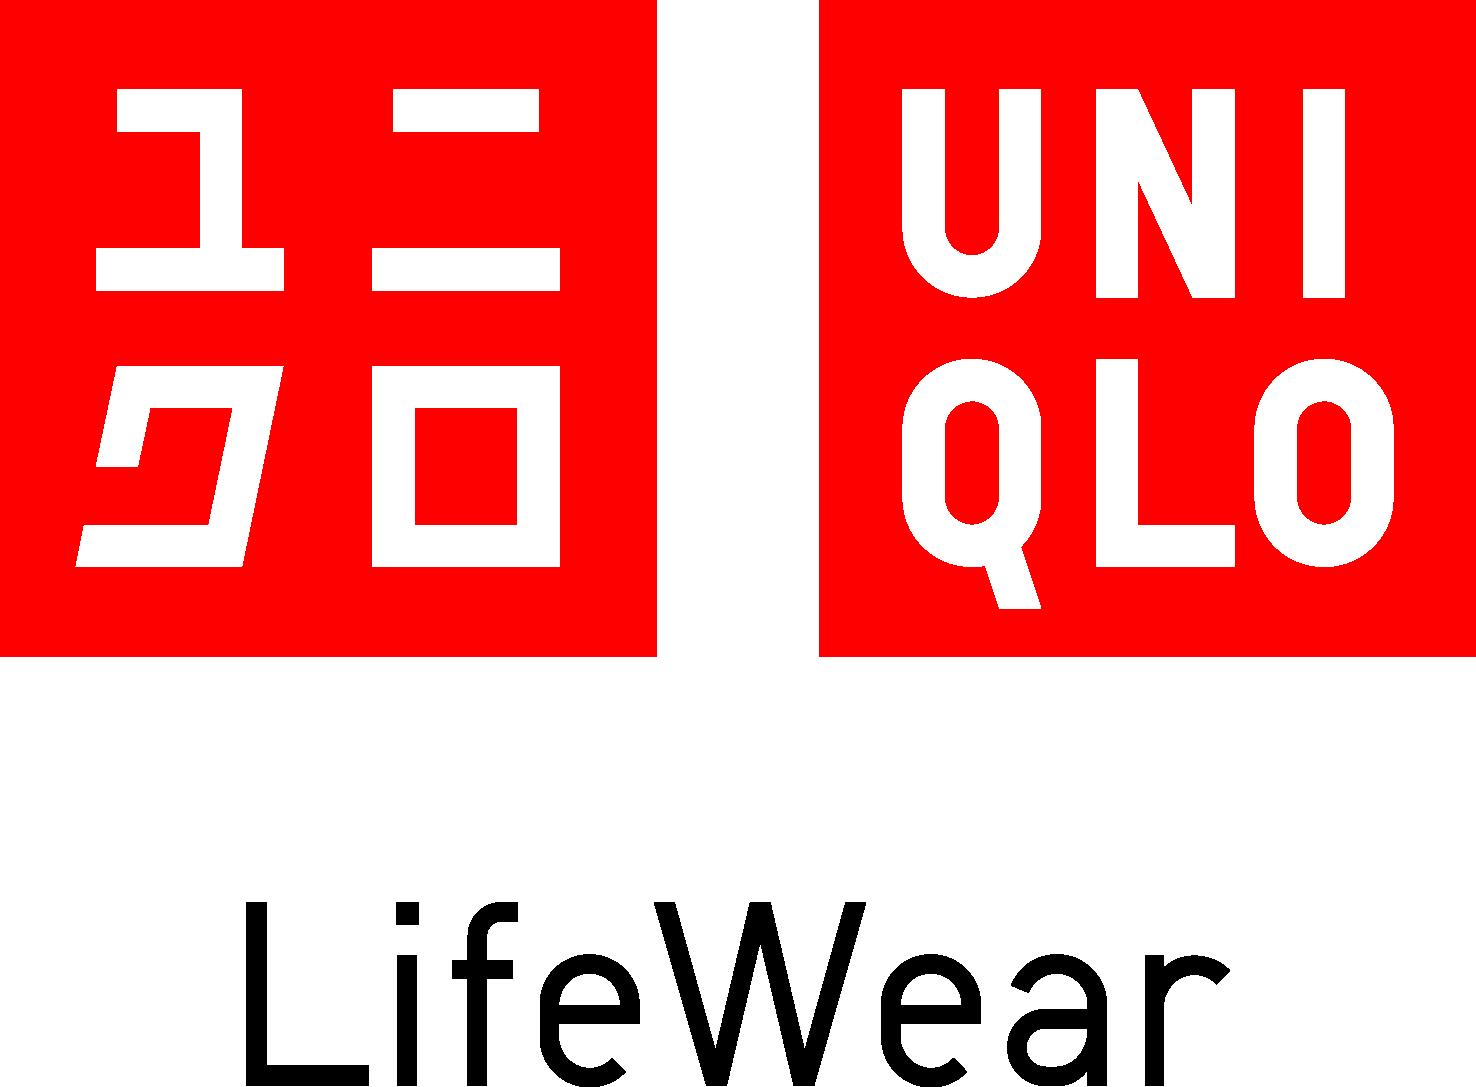 essay contest airlines logo jtb logo uniqlo logo